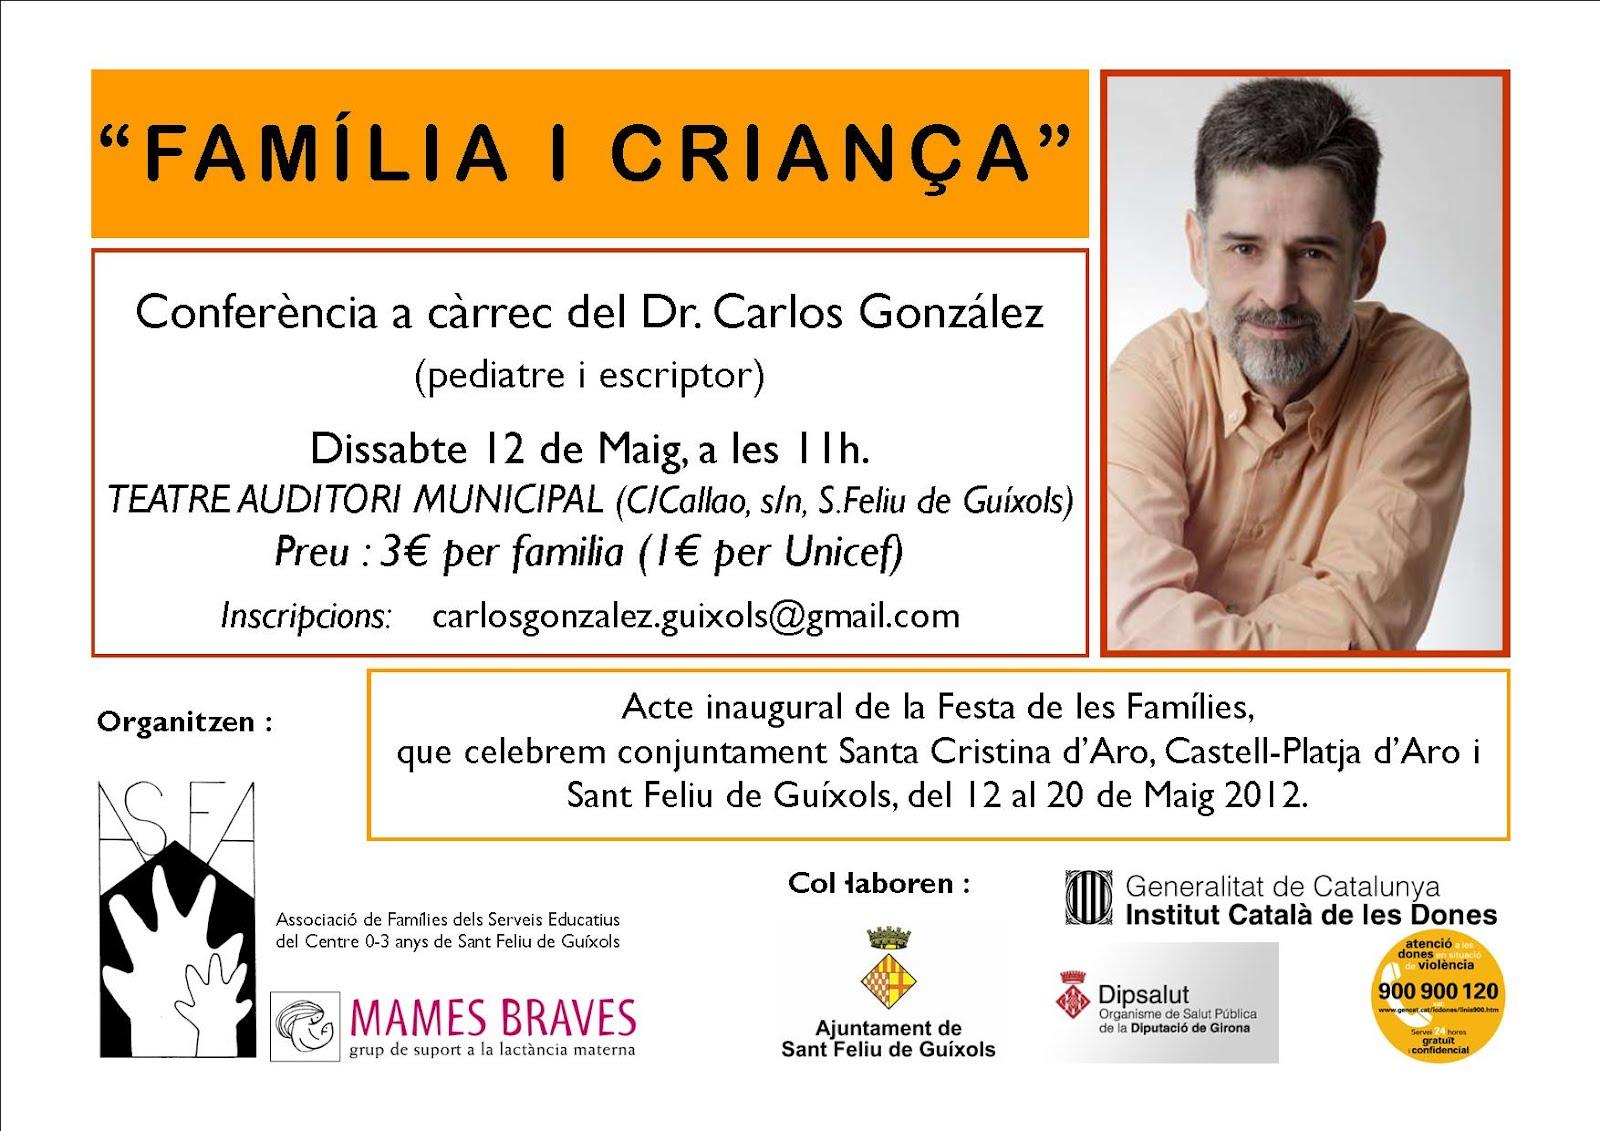 Dr. CARLOS GONZALEZ a Sant Feliu de Guíxols, dissabte 12 de Maig de 2012